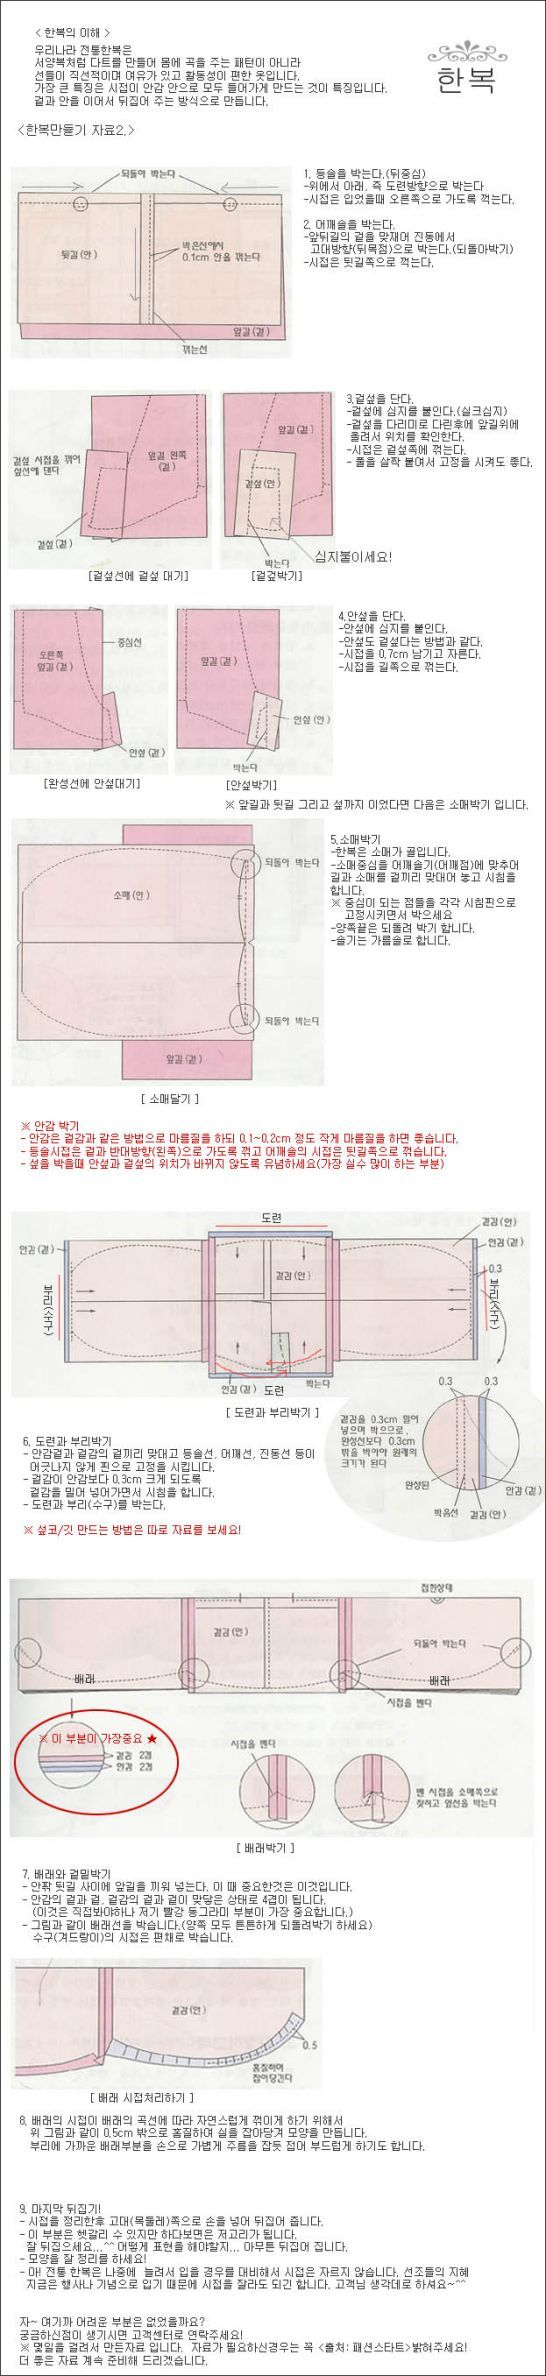 Daum 블로그 - 이미지 원본보기 | Ropa,zapato,etc. | Pinterest